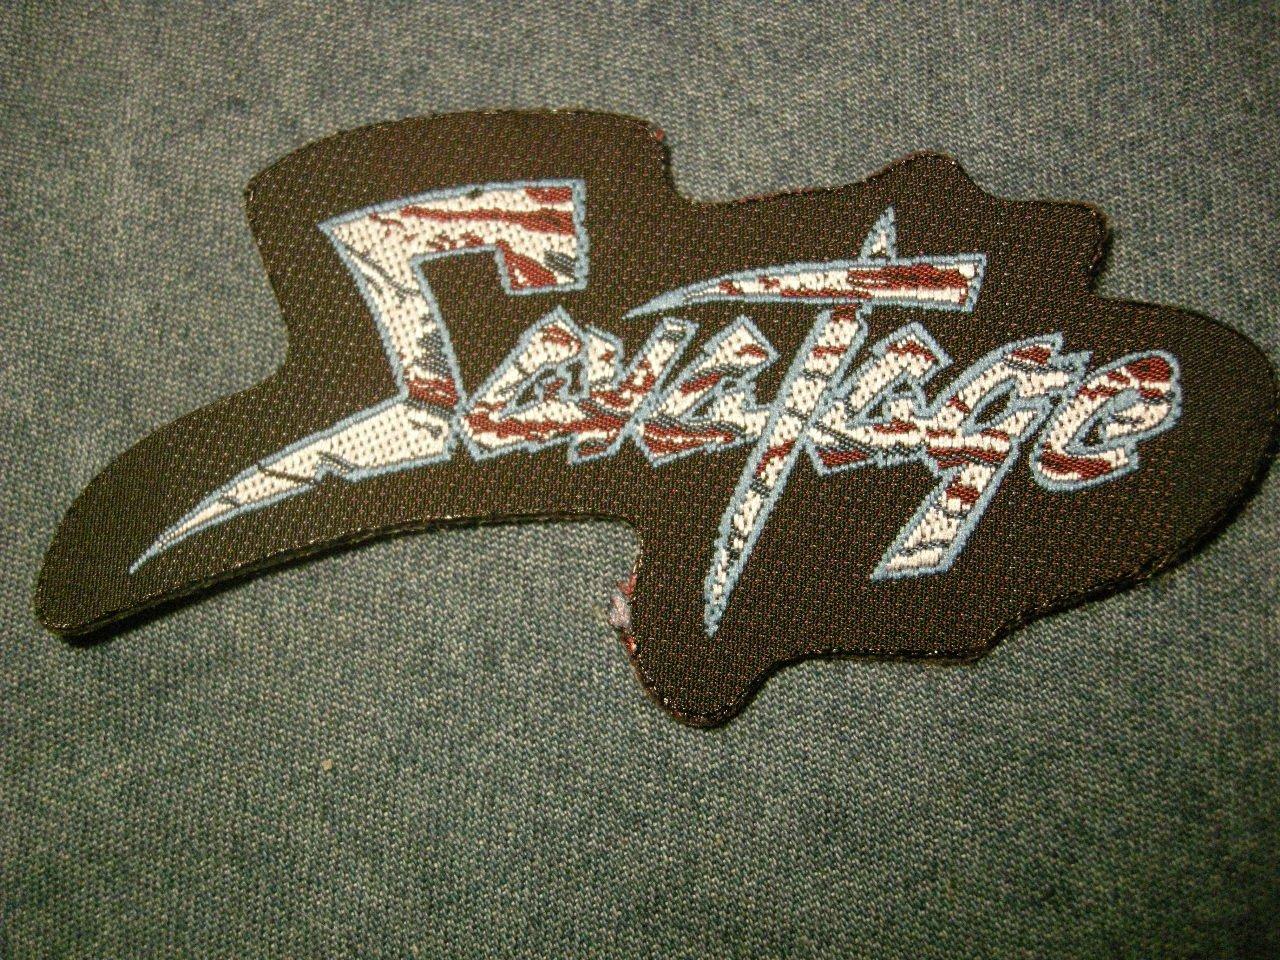 SAVATAGE sew-on PATCH classic logo jon oliva IMPORT